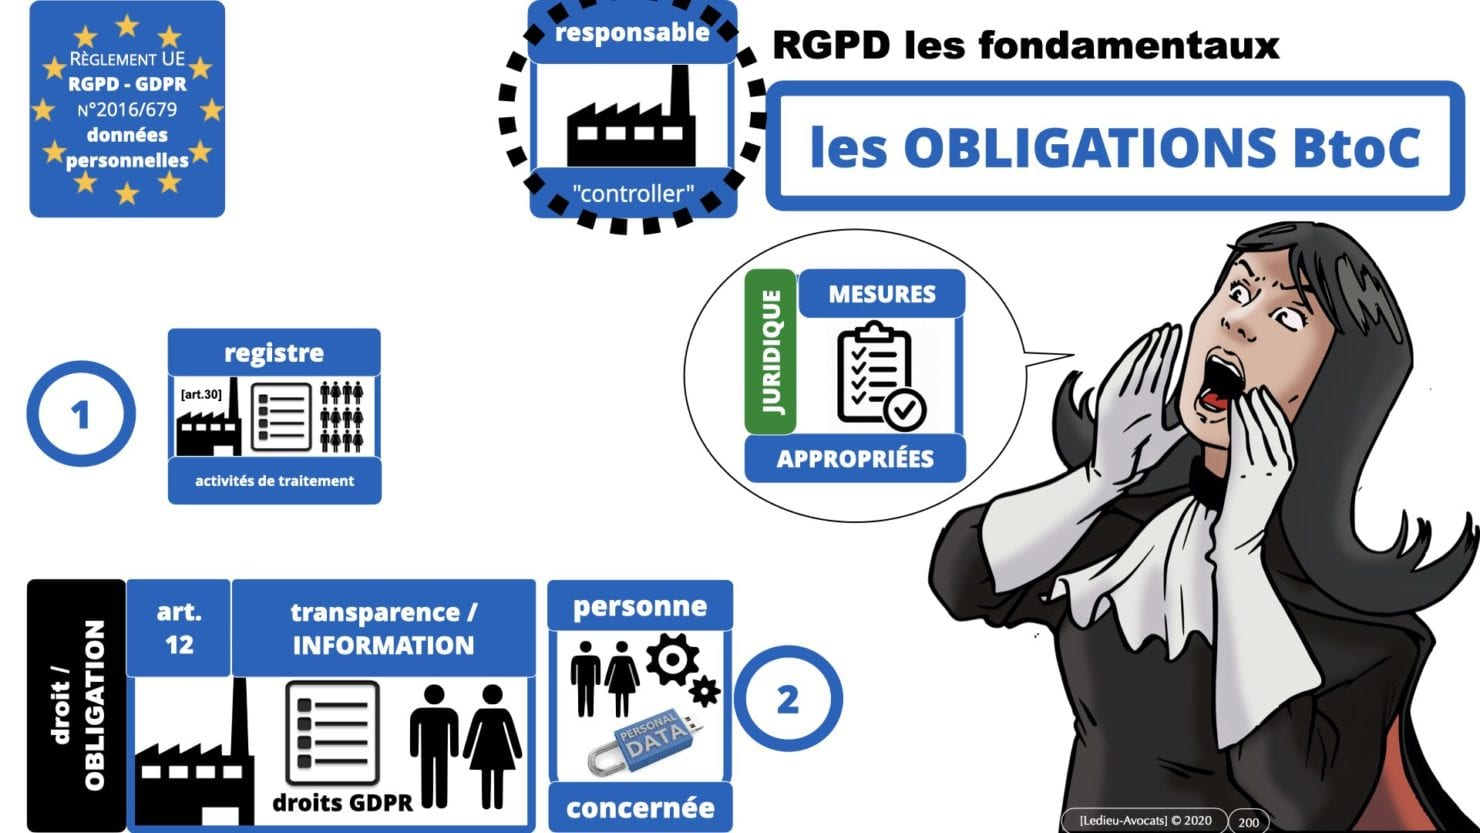 RGPD e-Privacy principes actualité jurisprudence ©Ledieu-Avocats 25-06-2021.200